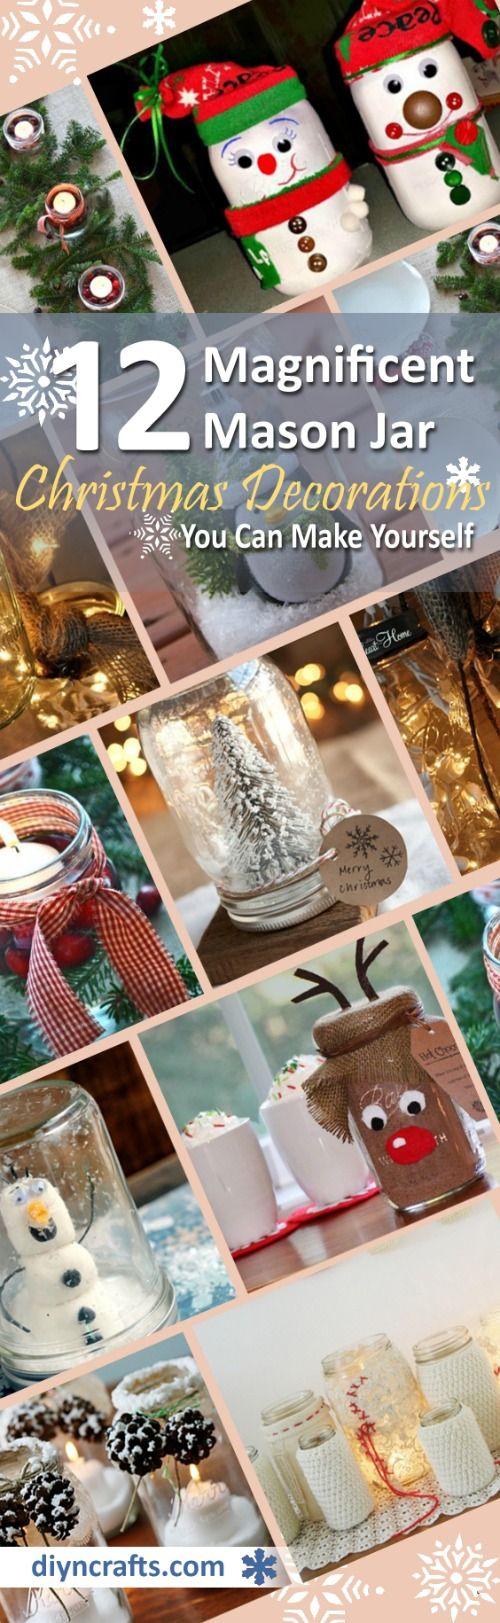 Christmas decorations you can make yourself - Best 25 Mason Jar Christmas Crafts Ideas On Pinterest Christmas Mason Jars Globe Website And Diy Snow Globe